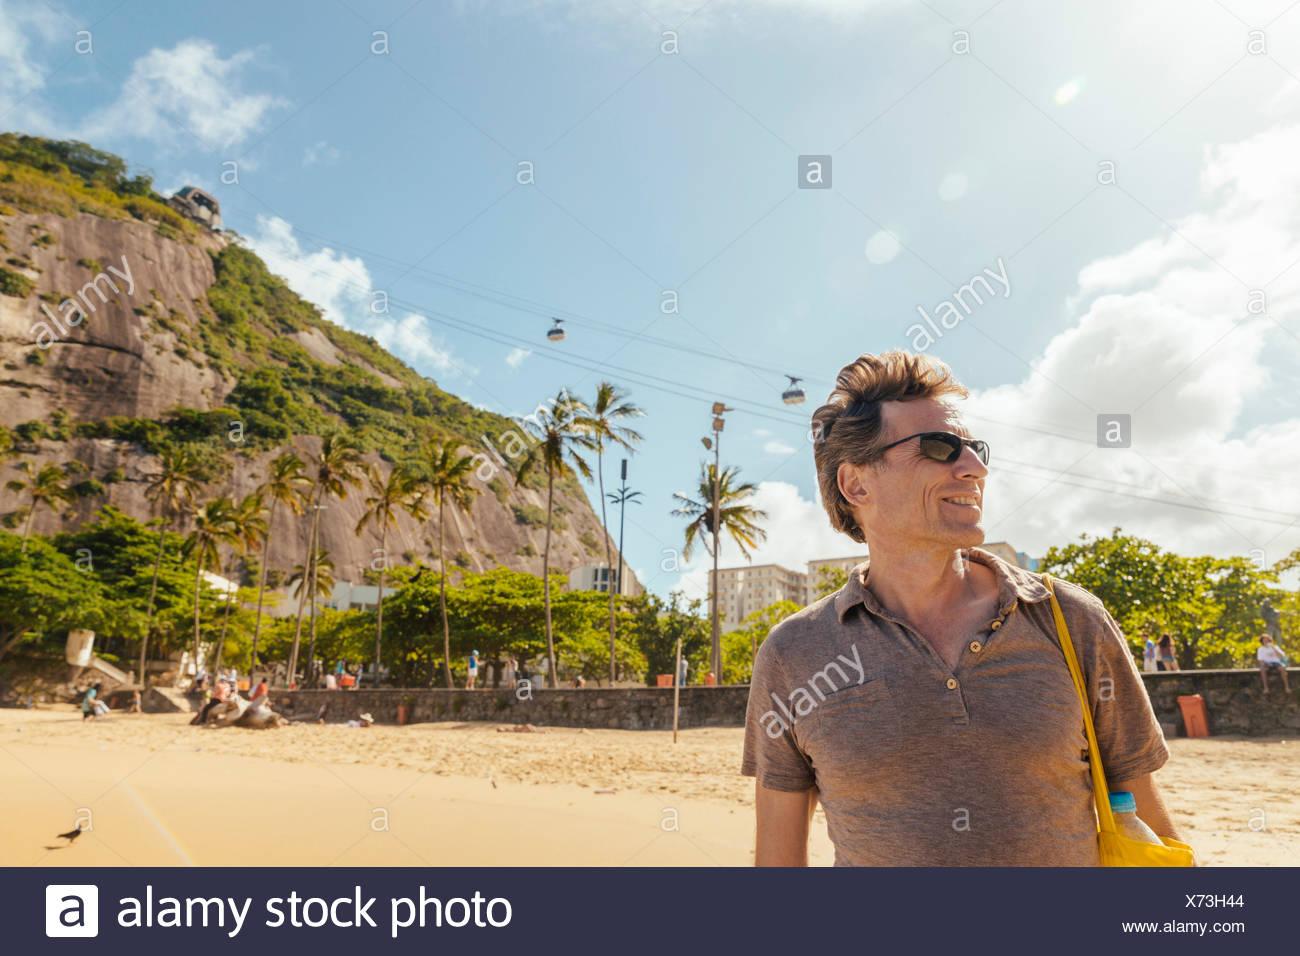 Brazil Morro da Urca behind a male tourist on Praia Vermelha in Rio de Janeiro Stock Photo